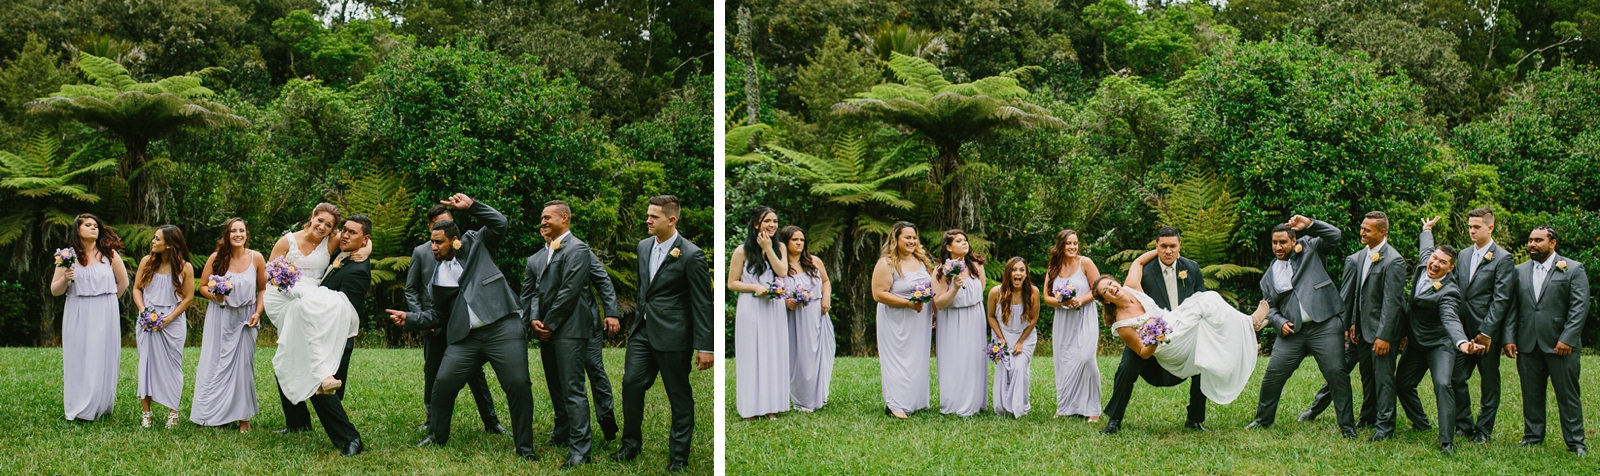 GabbyFiti_Auckland Wedding Photographer_Patty Lagera_0048.jpg